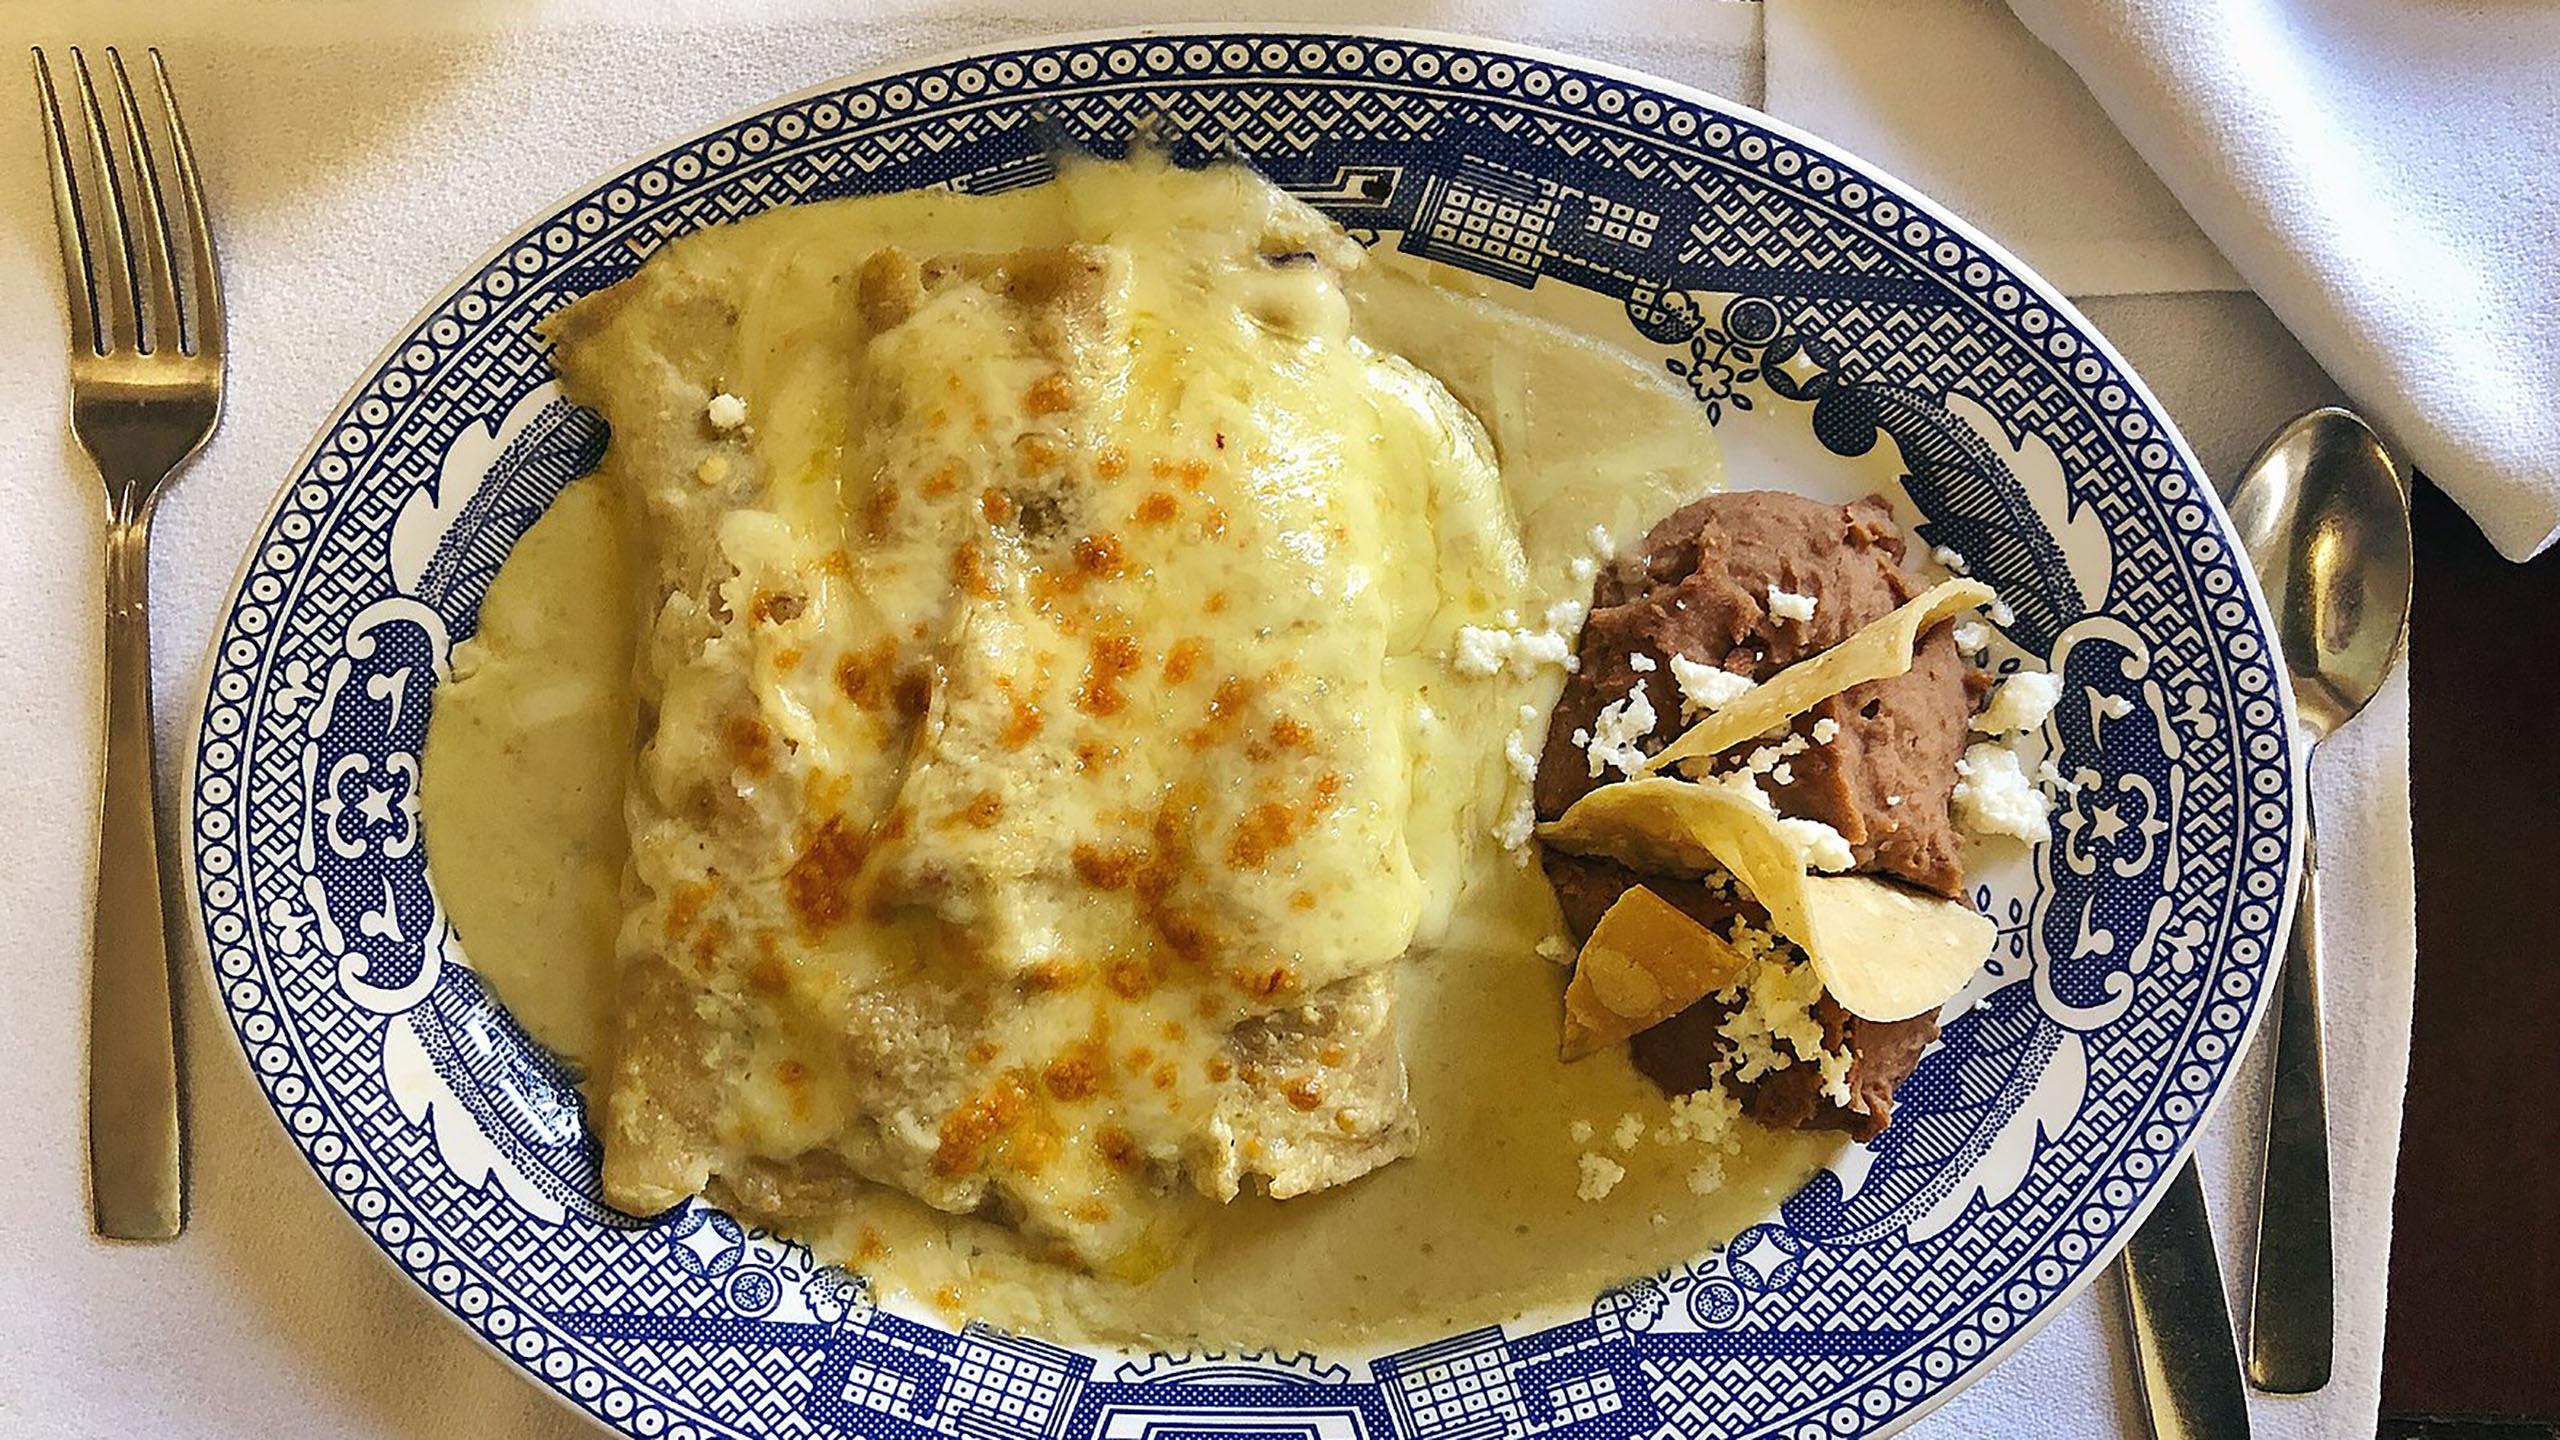 enchilada, enchiladas suizas